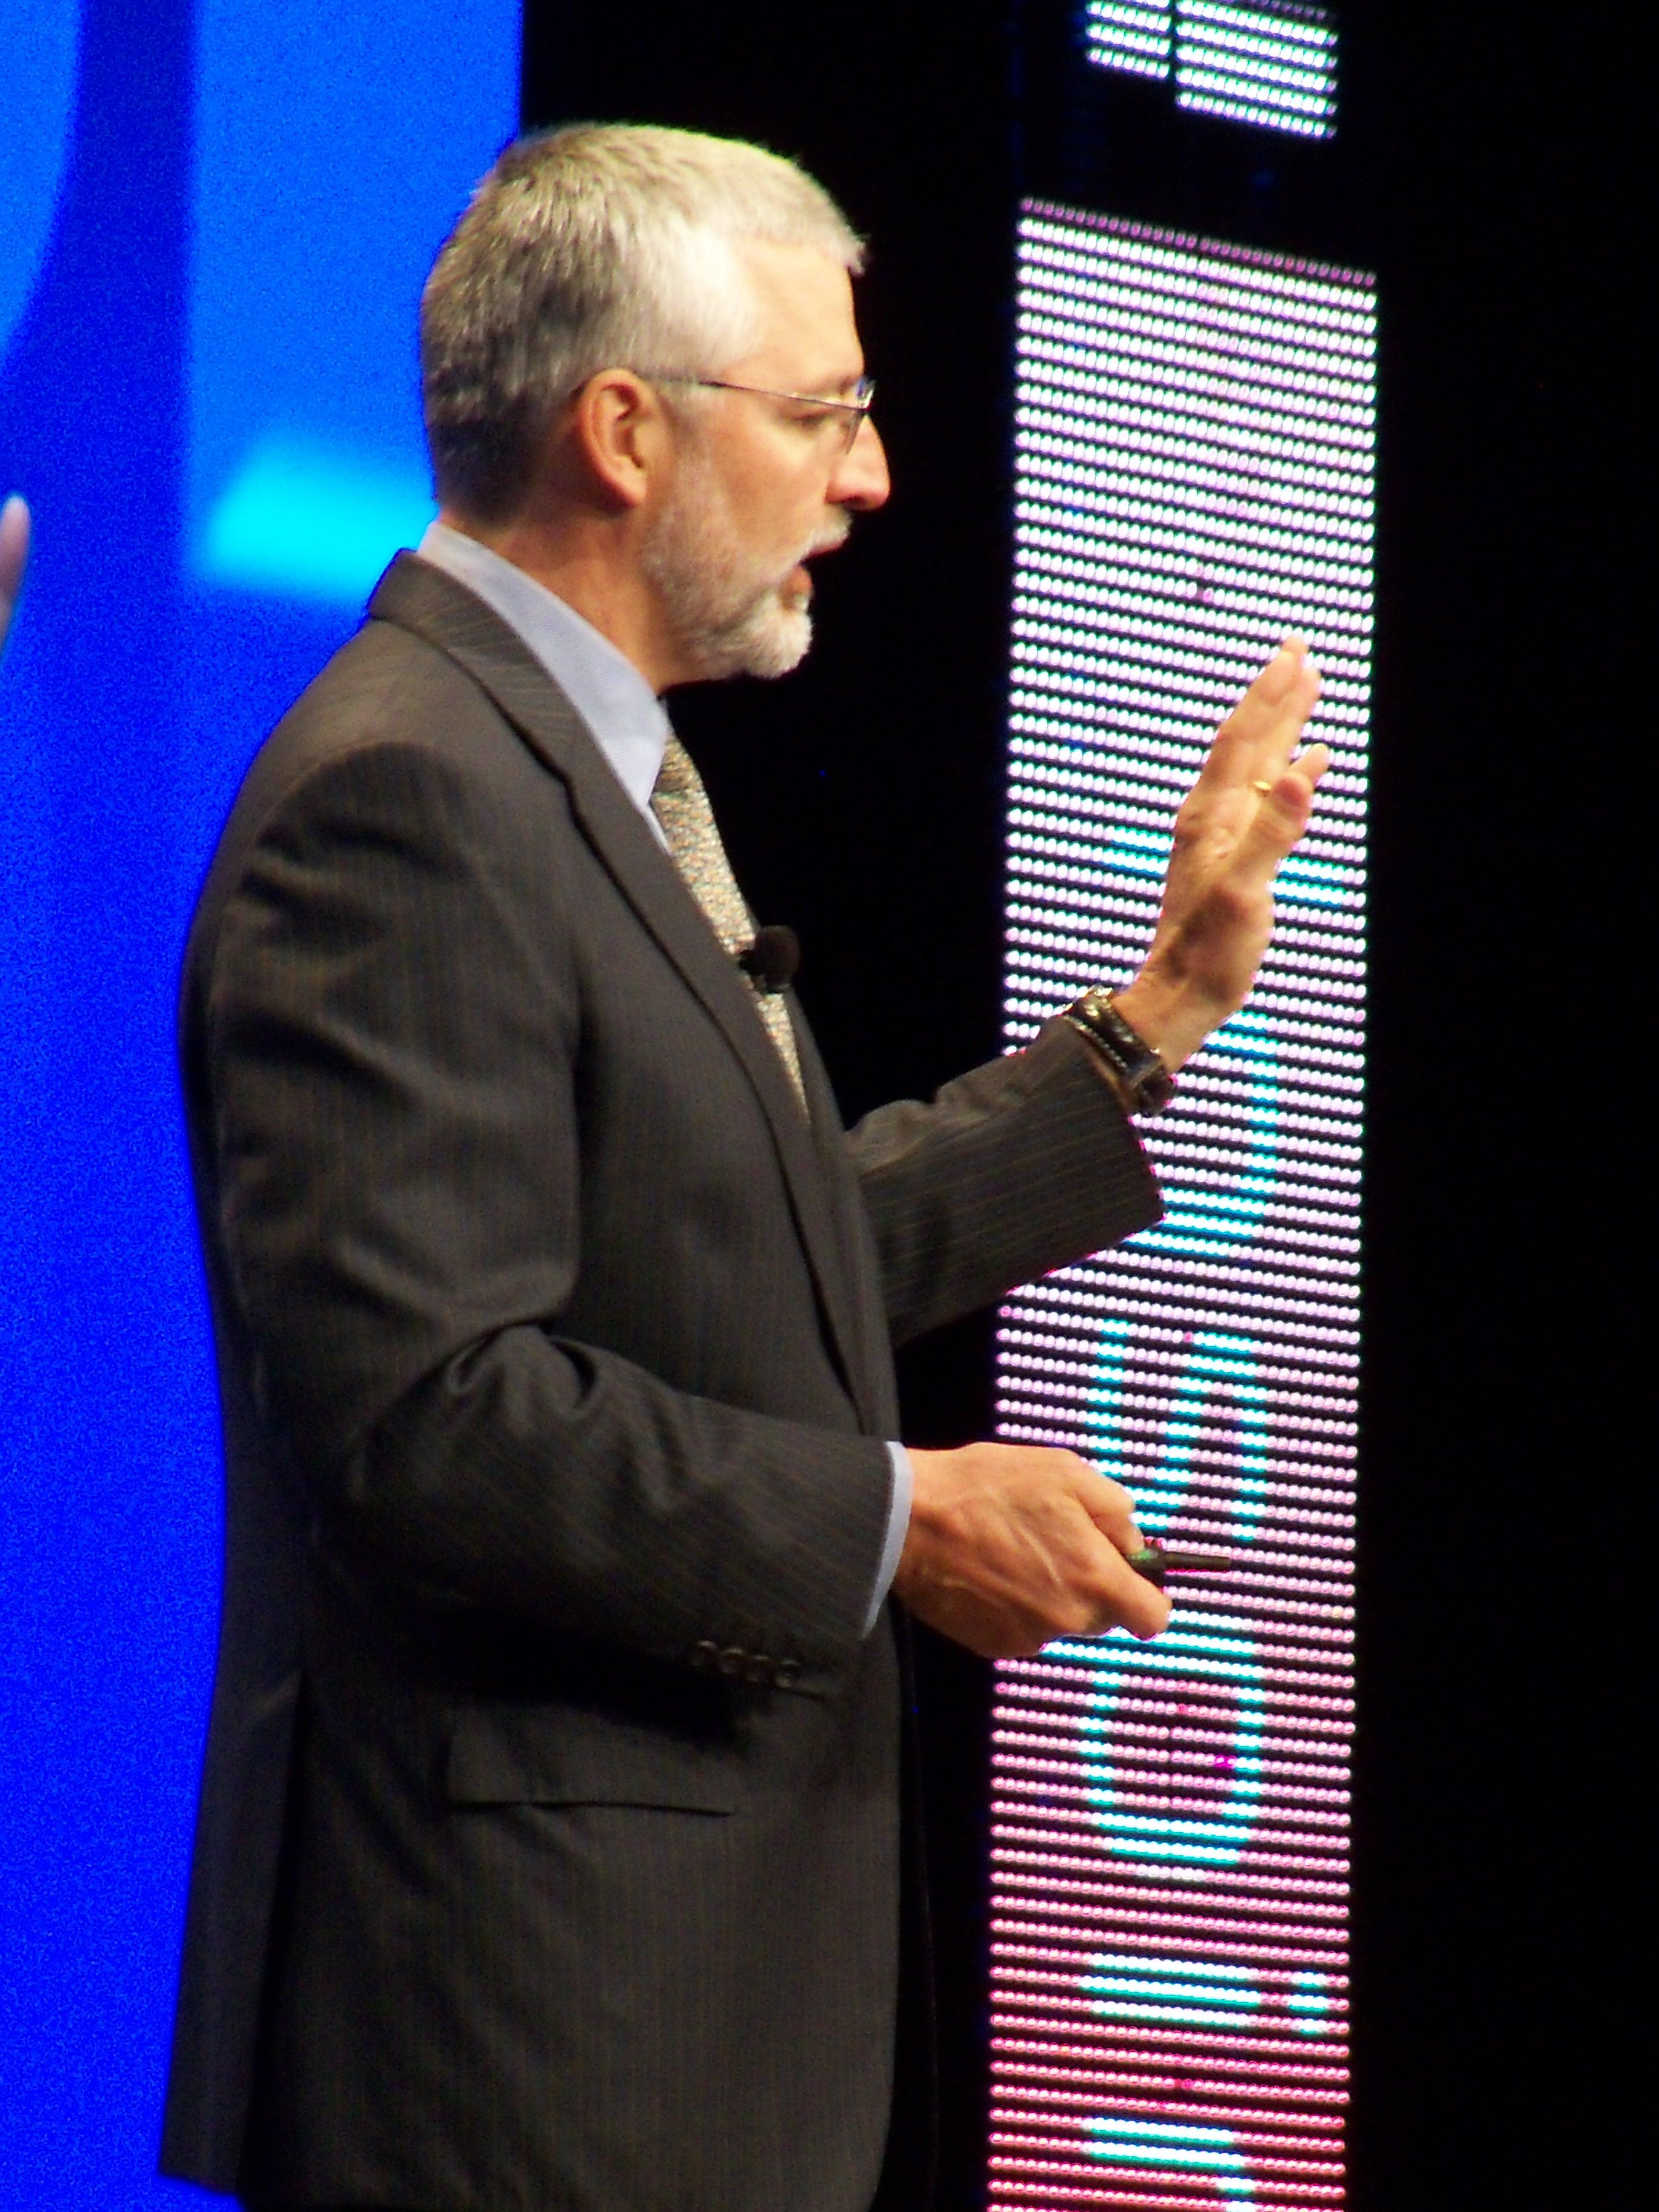 NetSuite CEO Zach Nelson - copyright 2012 TechVentive, Inc.